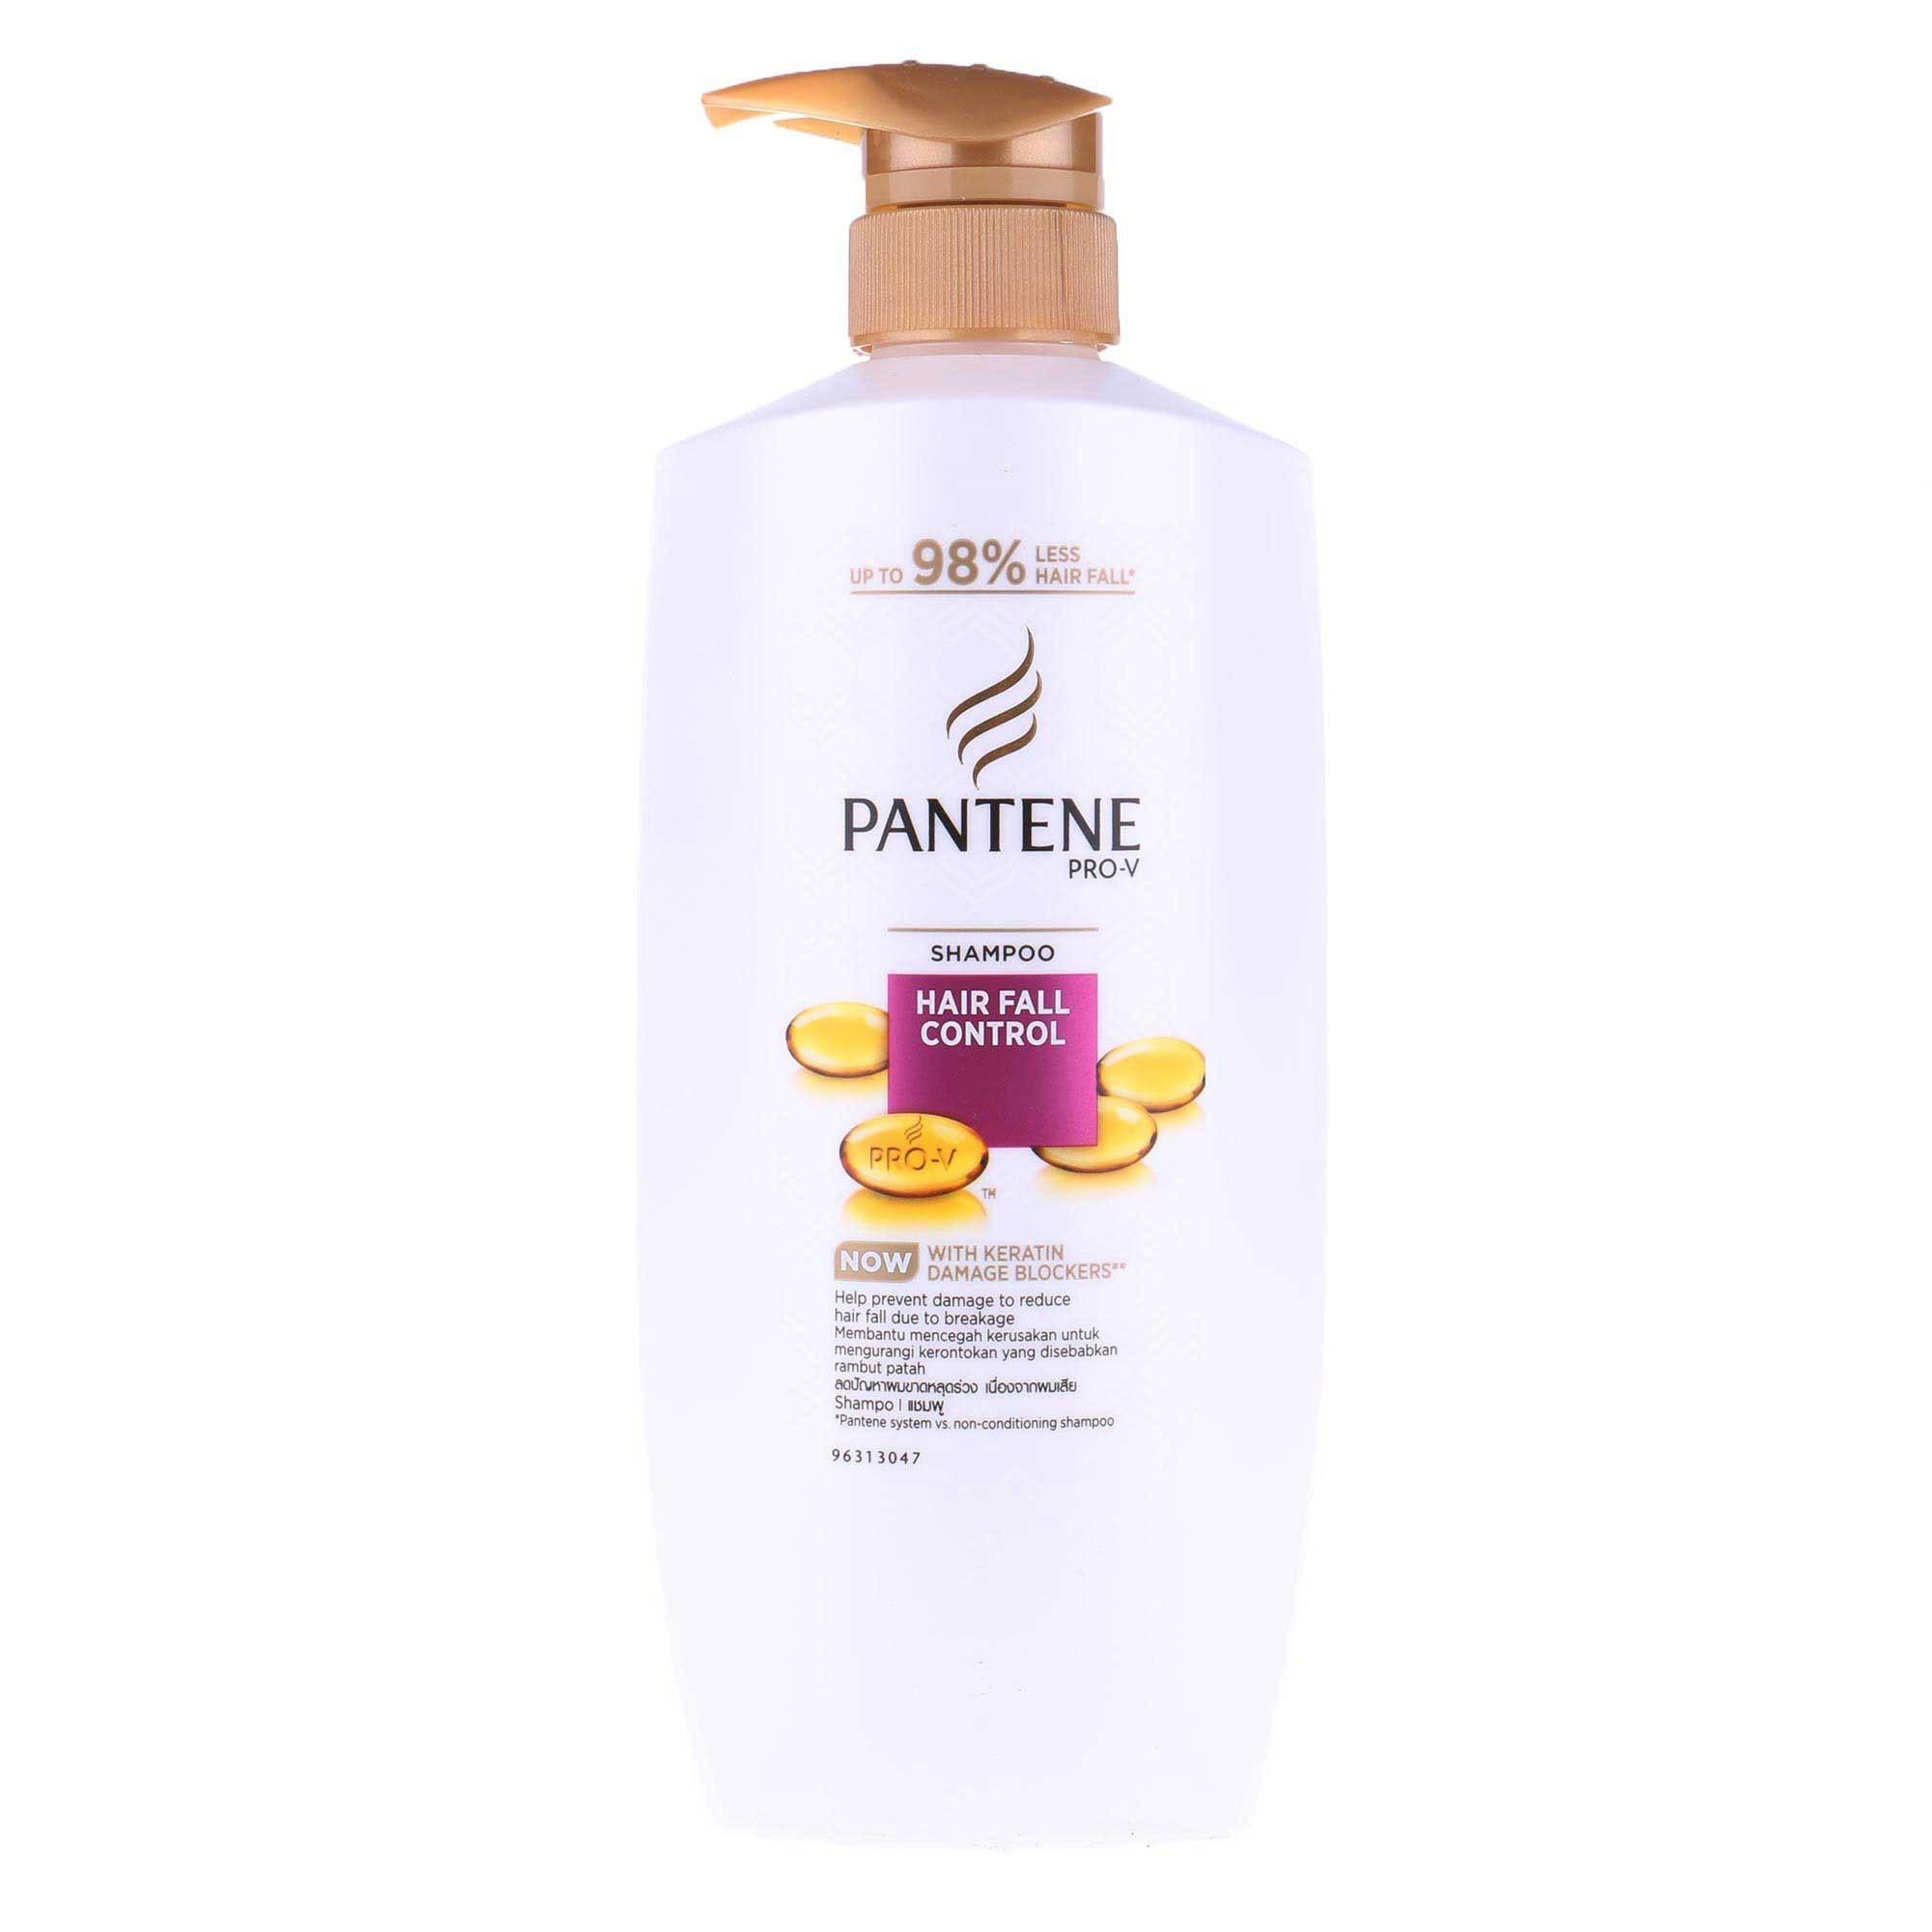 PANTENE Shampoo Hair Fall Control 670mlIDR83300. Rp 85.500. Pantene Shampoo Hair